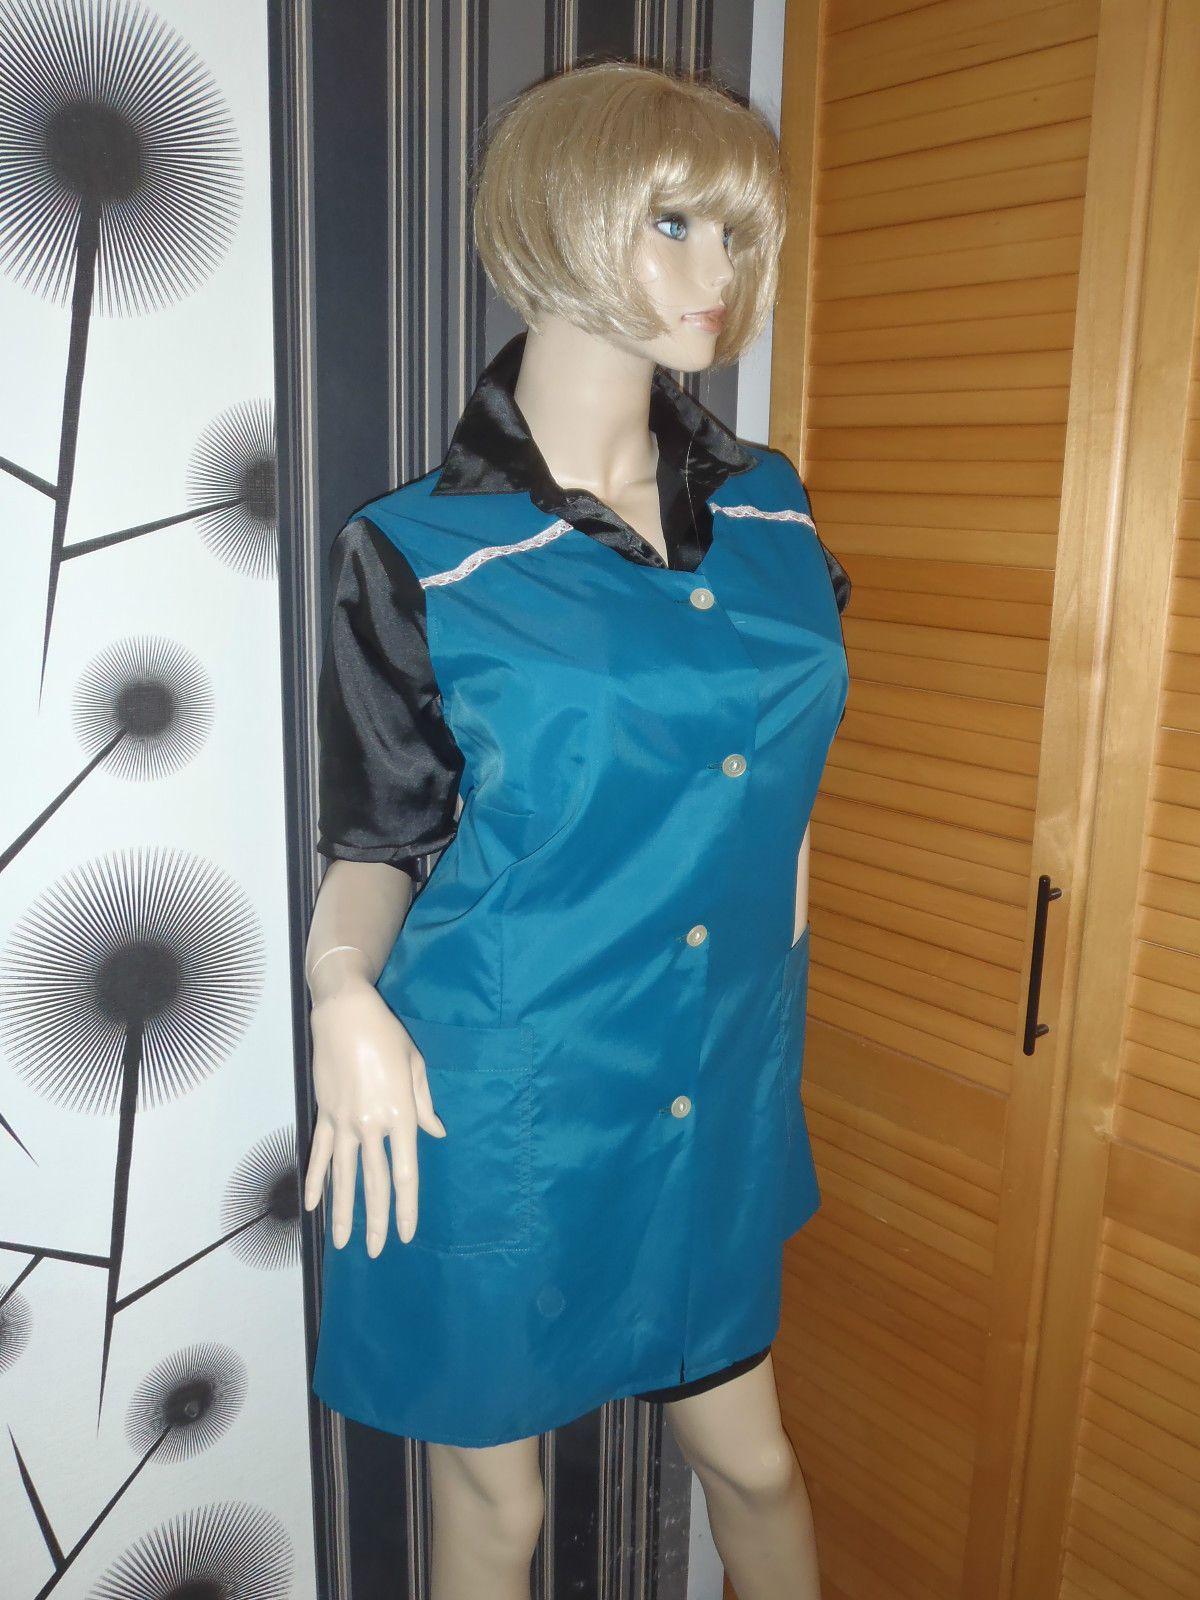 Nylon Kittel Schürze Vintage Glanz Blouse Sissy Boy Shiny Silk Apron Overall in Kleidung & Accessoires, Vintage-Mode, Vintage-Mode für Damen | eBay!